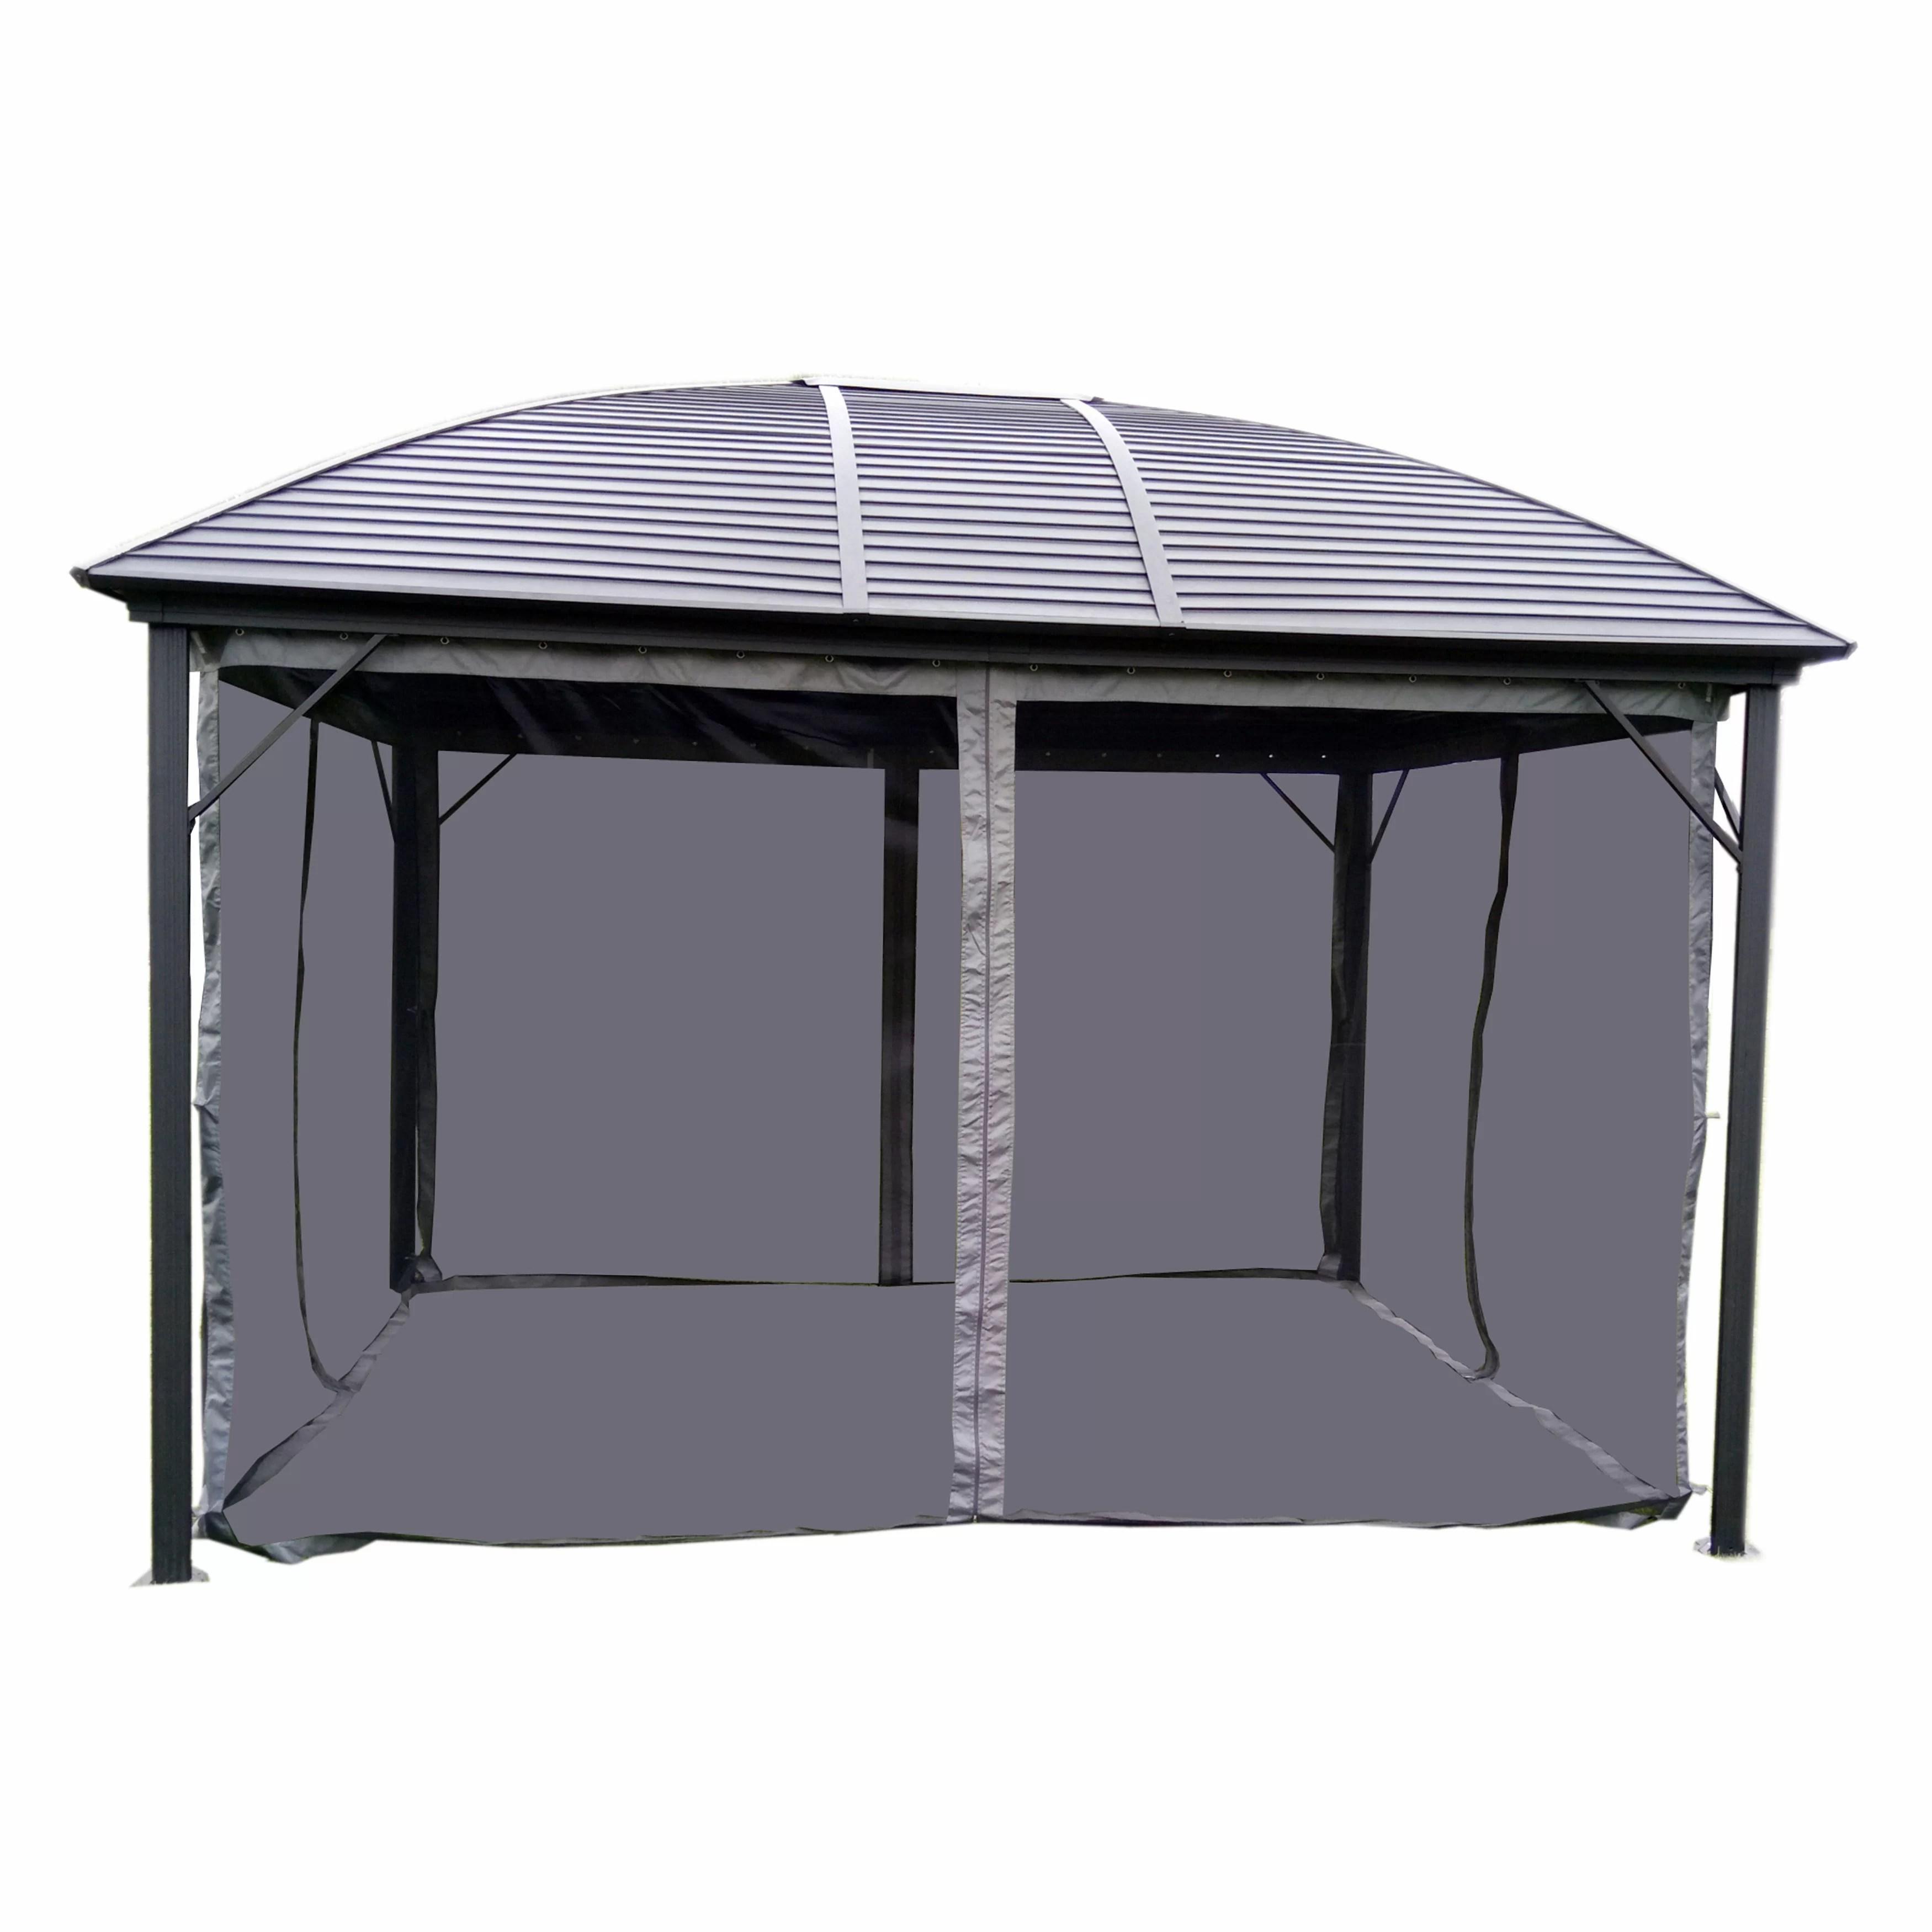 round roof 12 ft w x 10 ft d metal patio gazebo